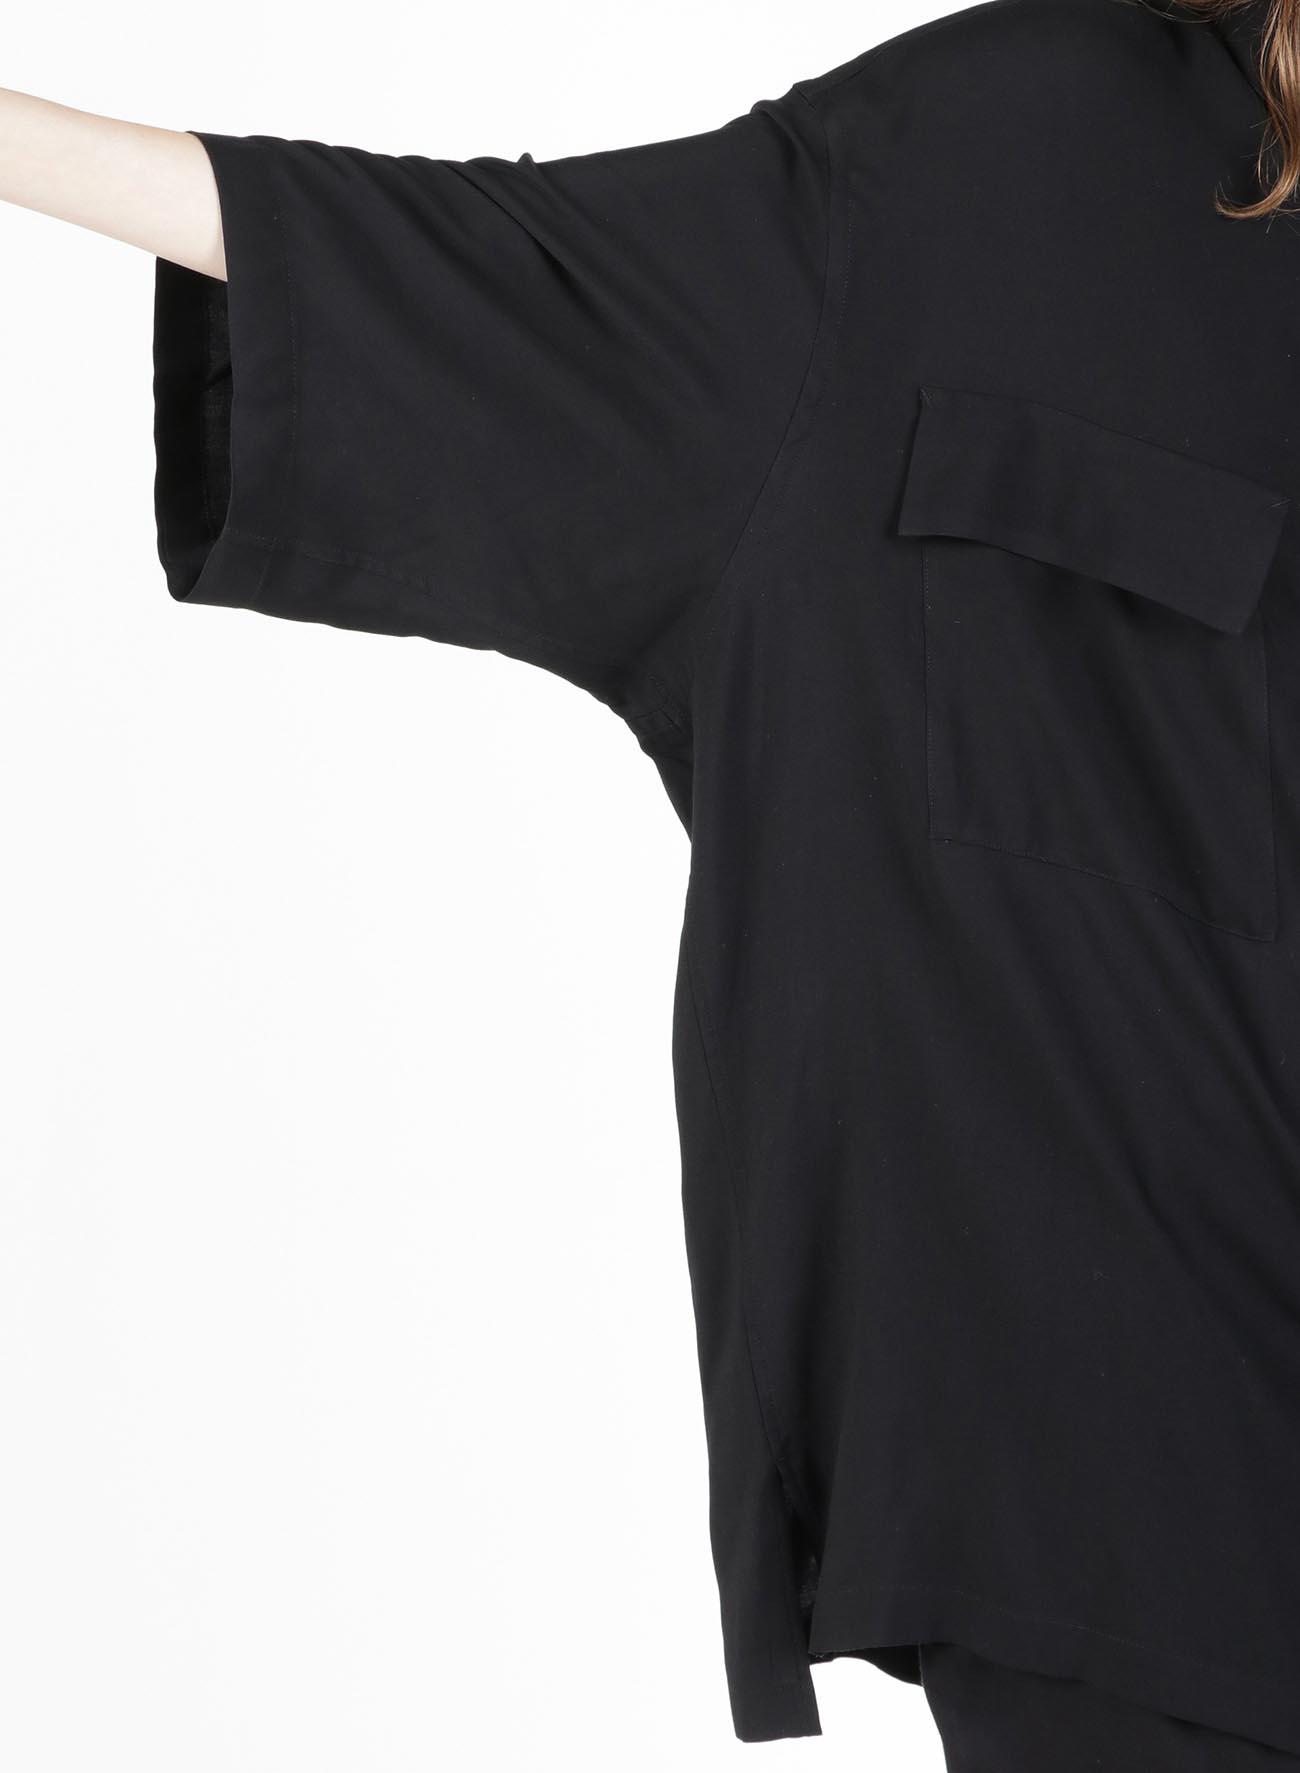 60s Ry/Span Twill Washer Double Pocket Regular Big Shirt